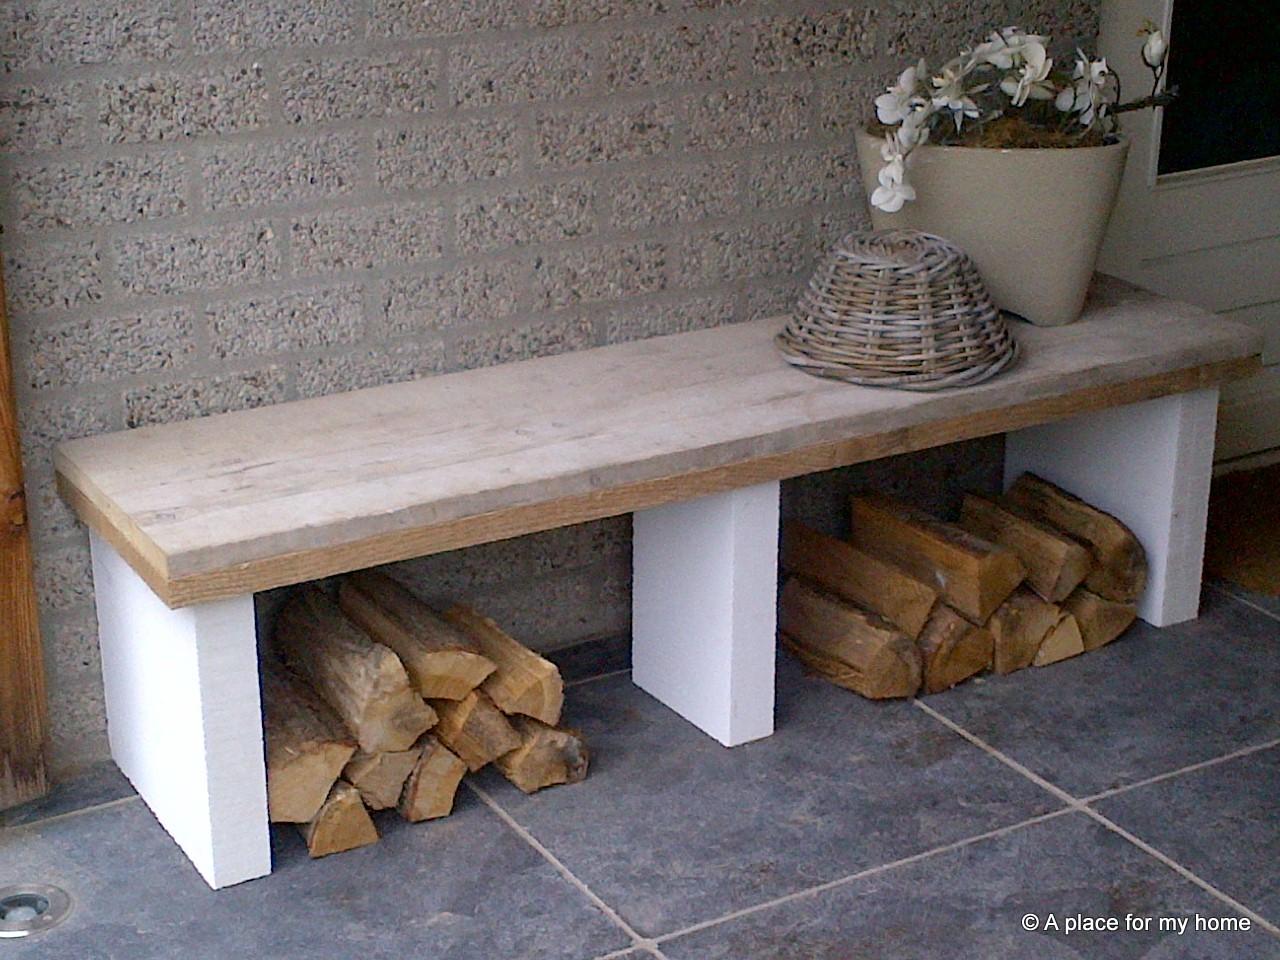 A place for my home de verbouwing - Decoratie stenen tuin ...